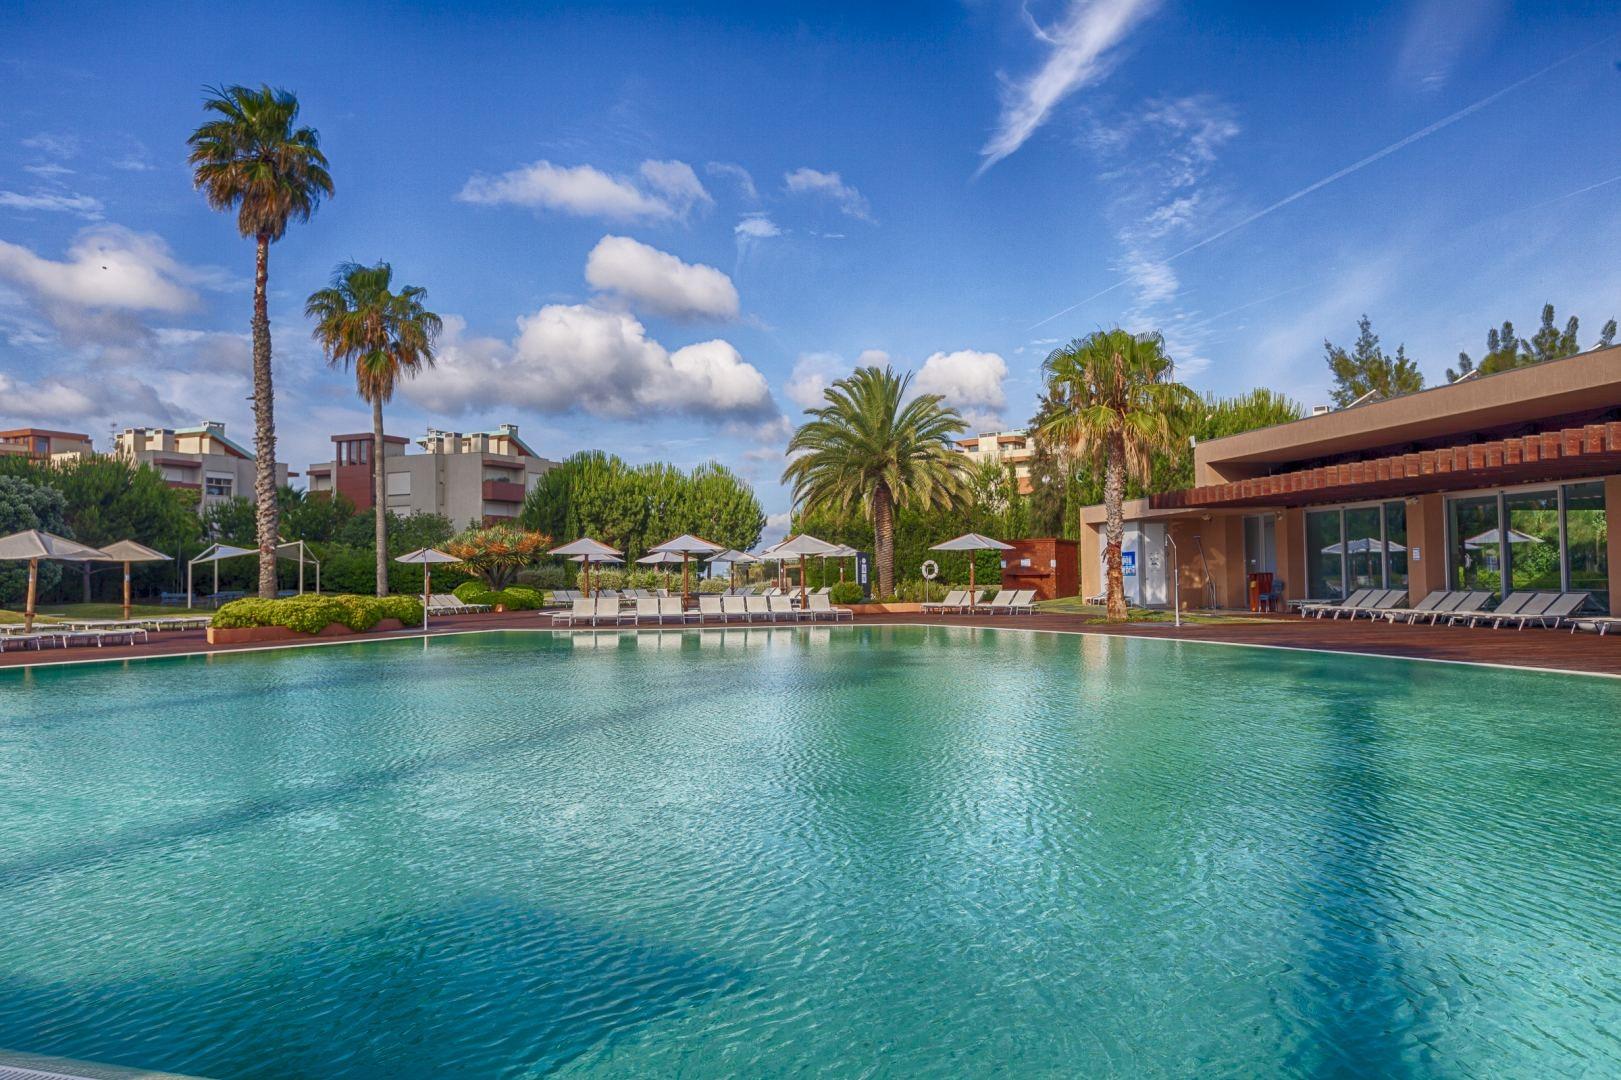 Aqualuz-Troia_piscina-exterior_1806_0718